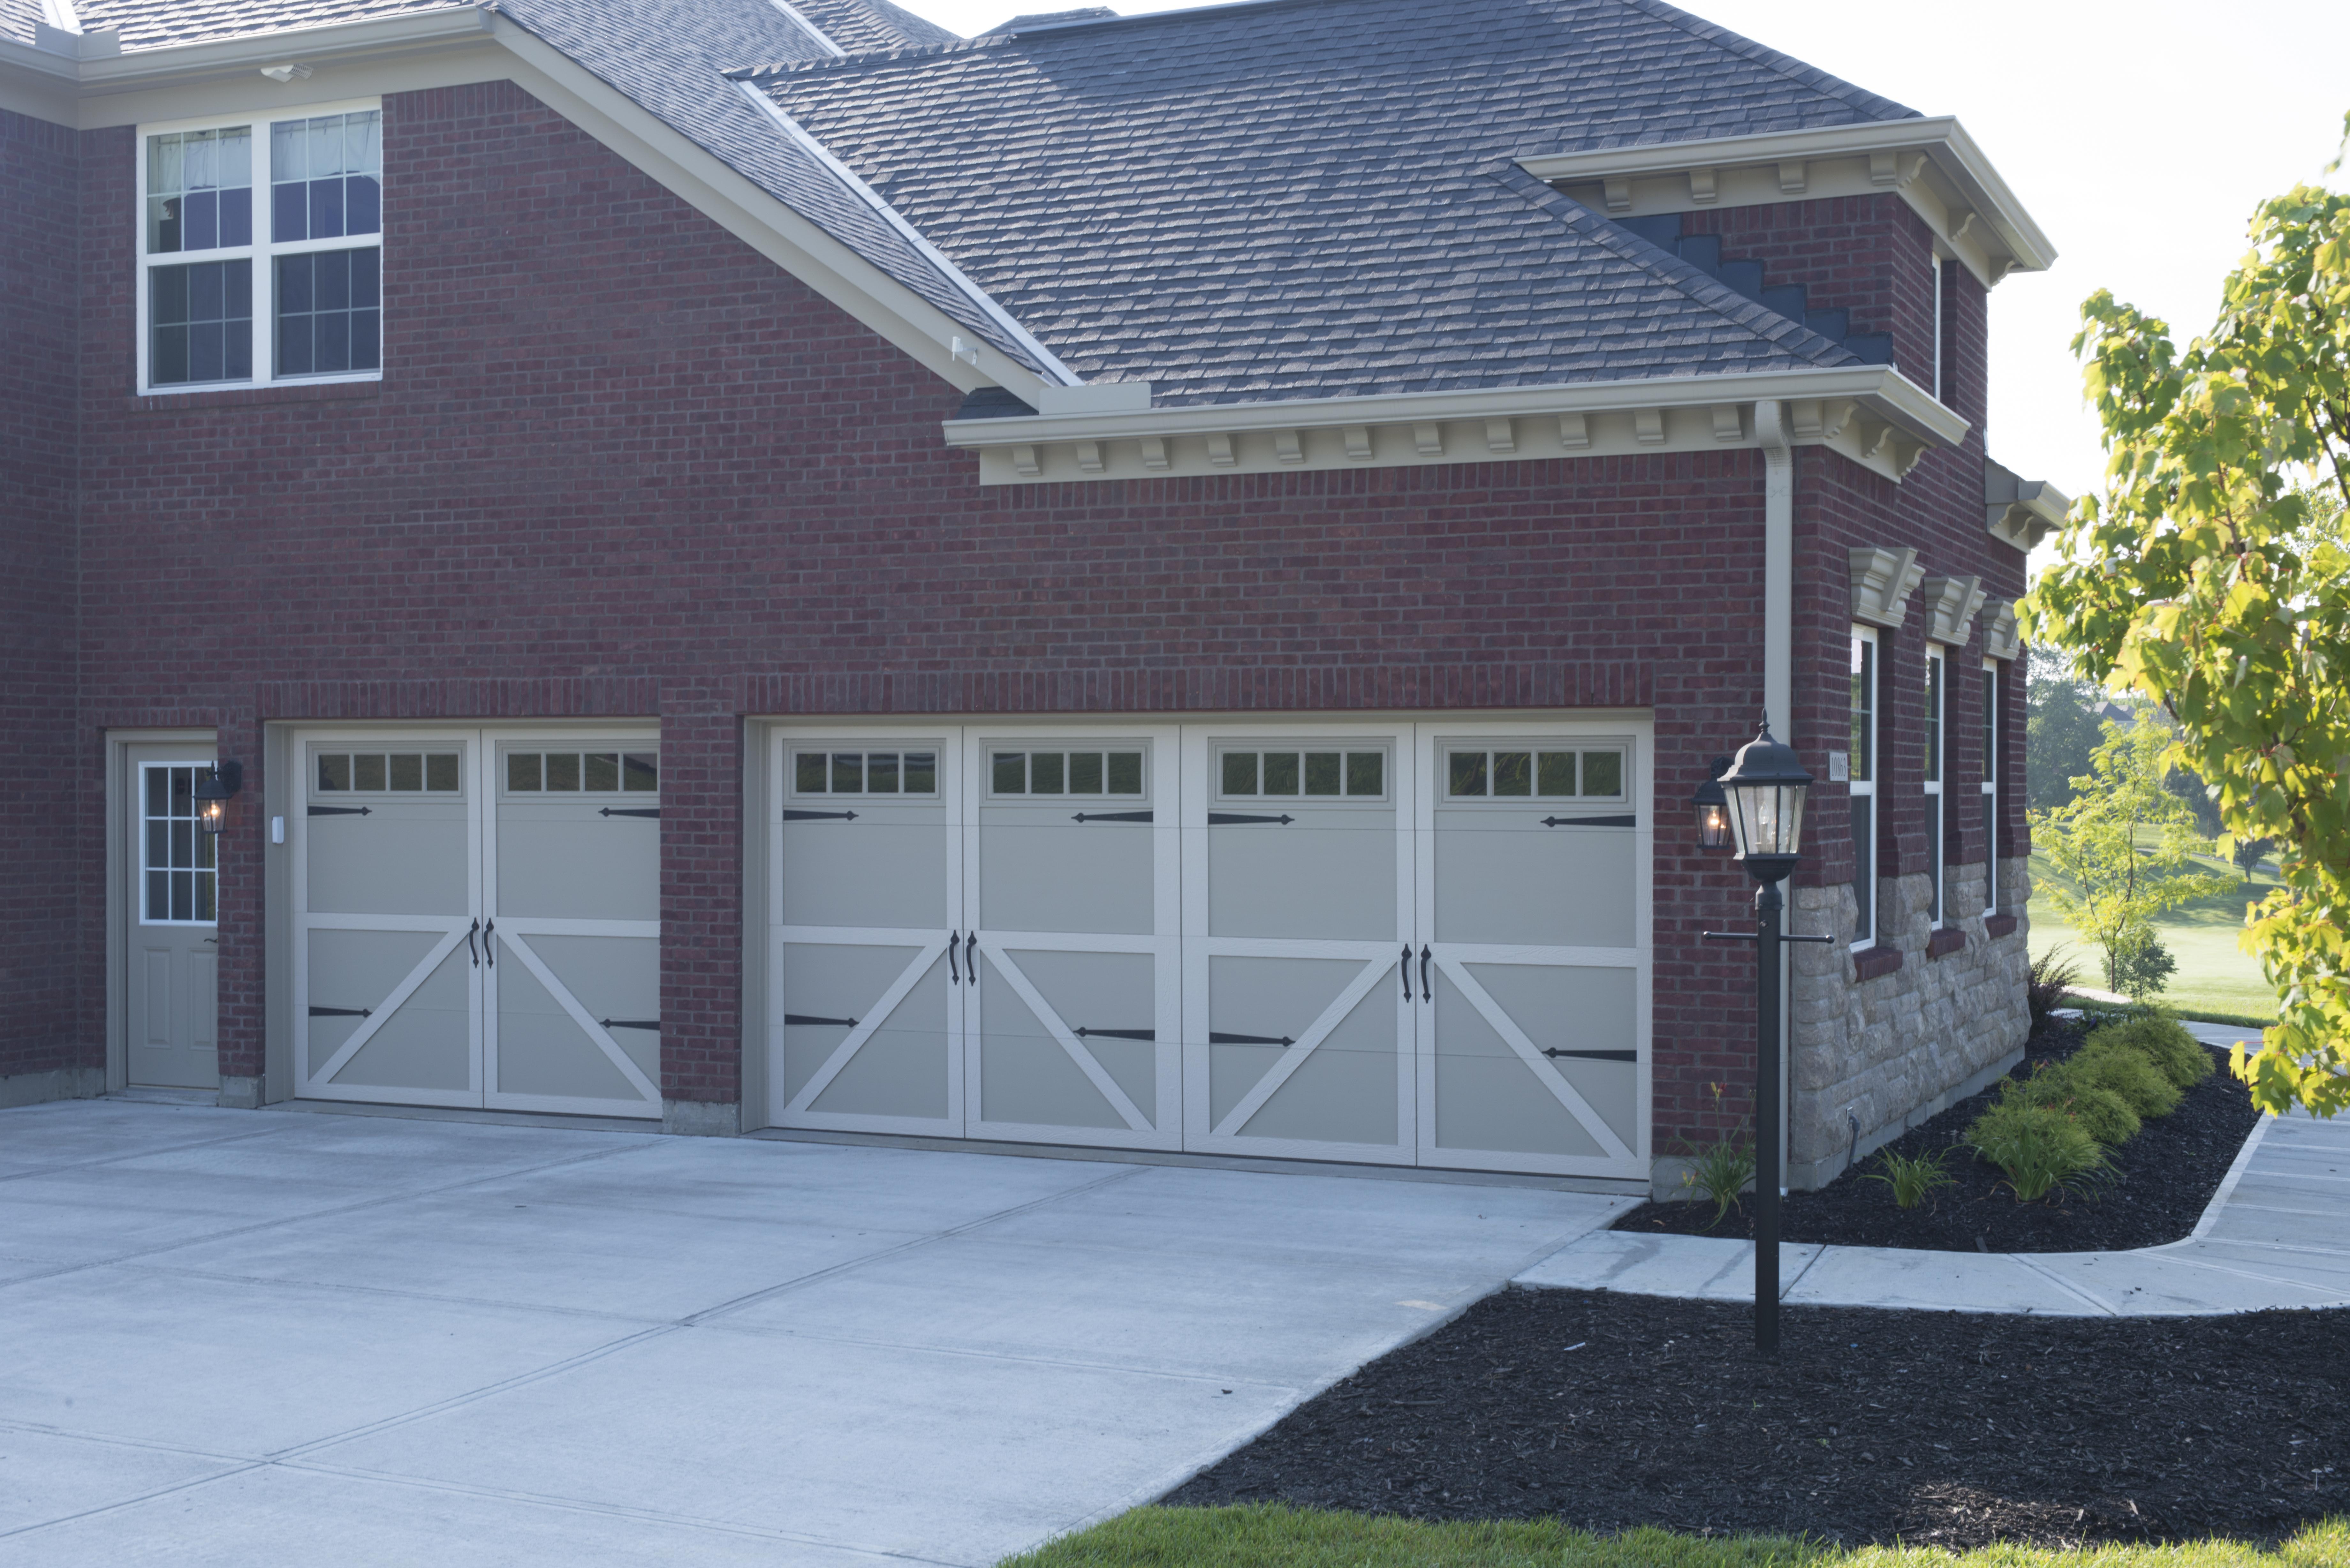 165B Series with Stockbridge windows